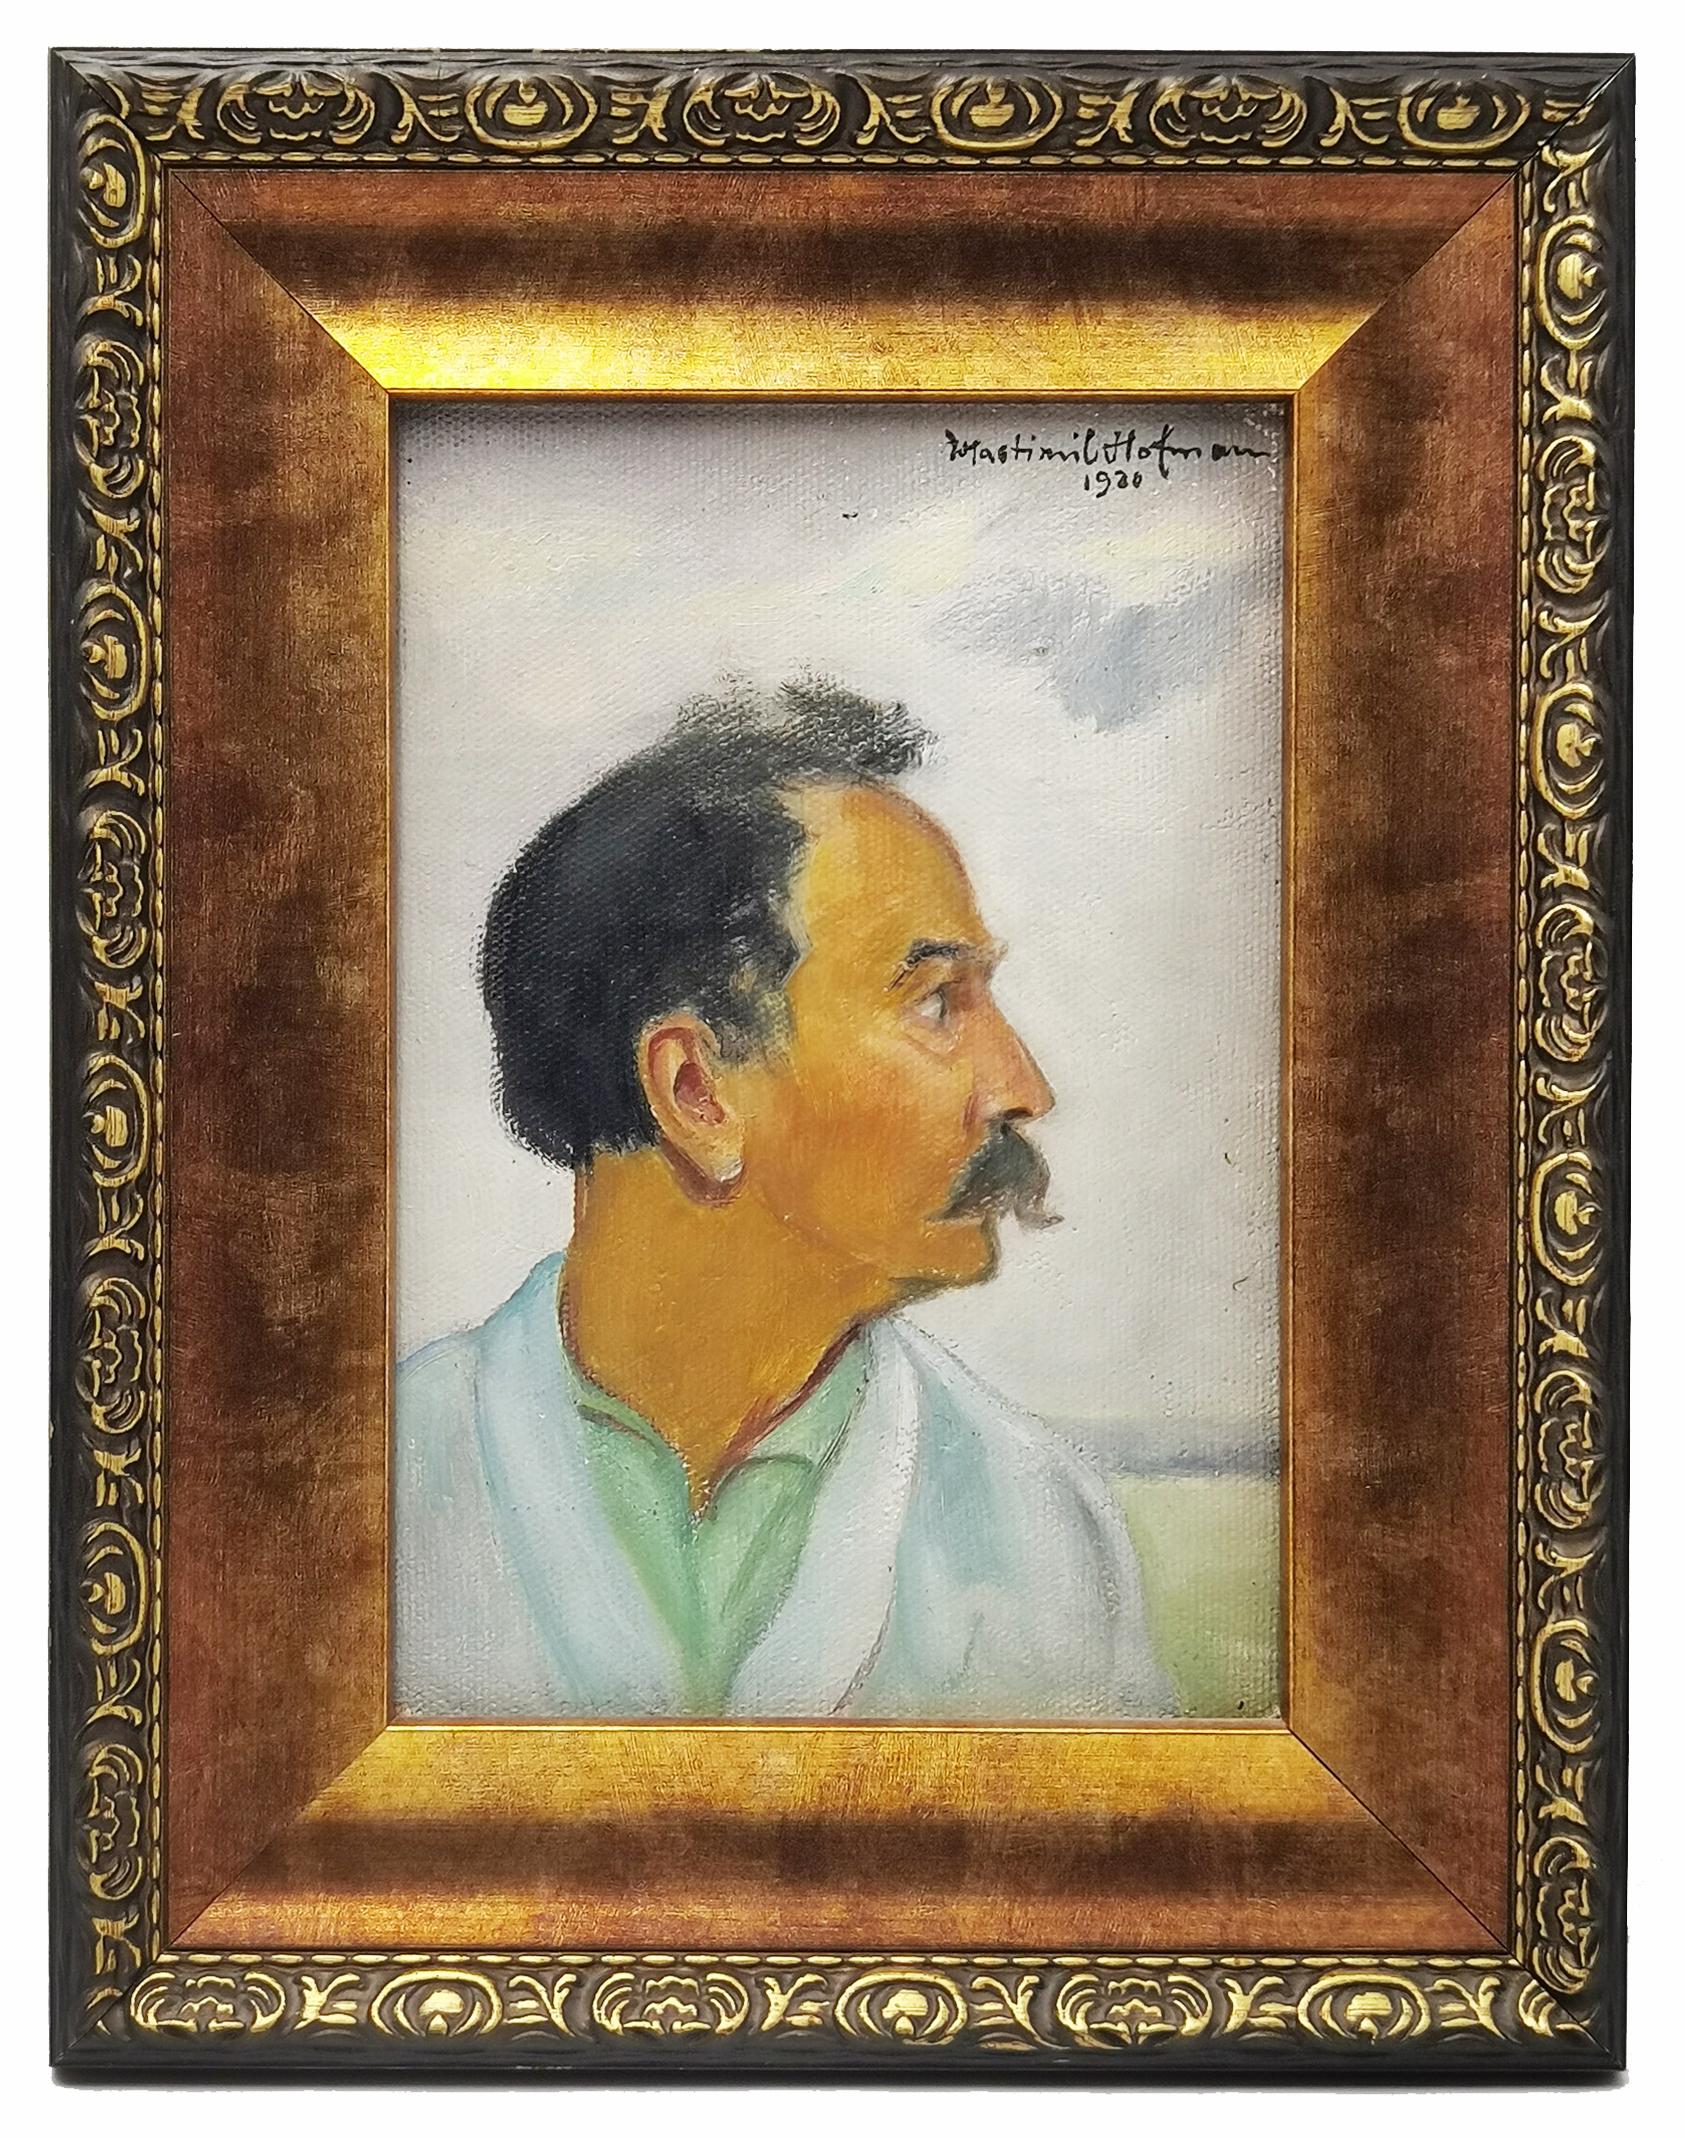 Autoportret z profilu, 1920